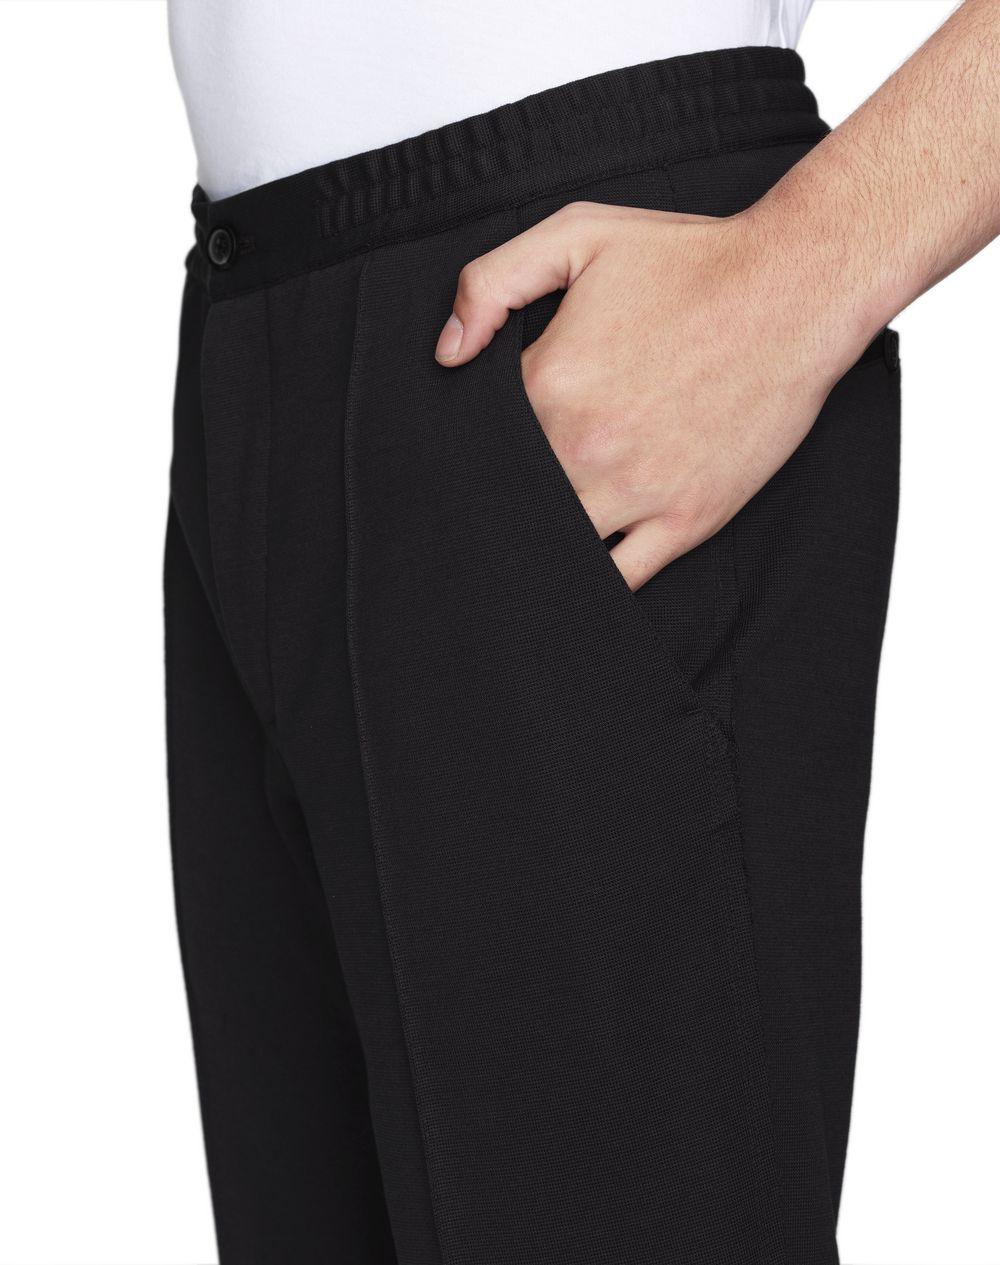 STRAIGHT-LEG MILANO KNIT-EFFECT PANTS - Lanvin